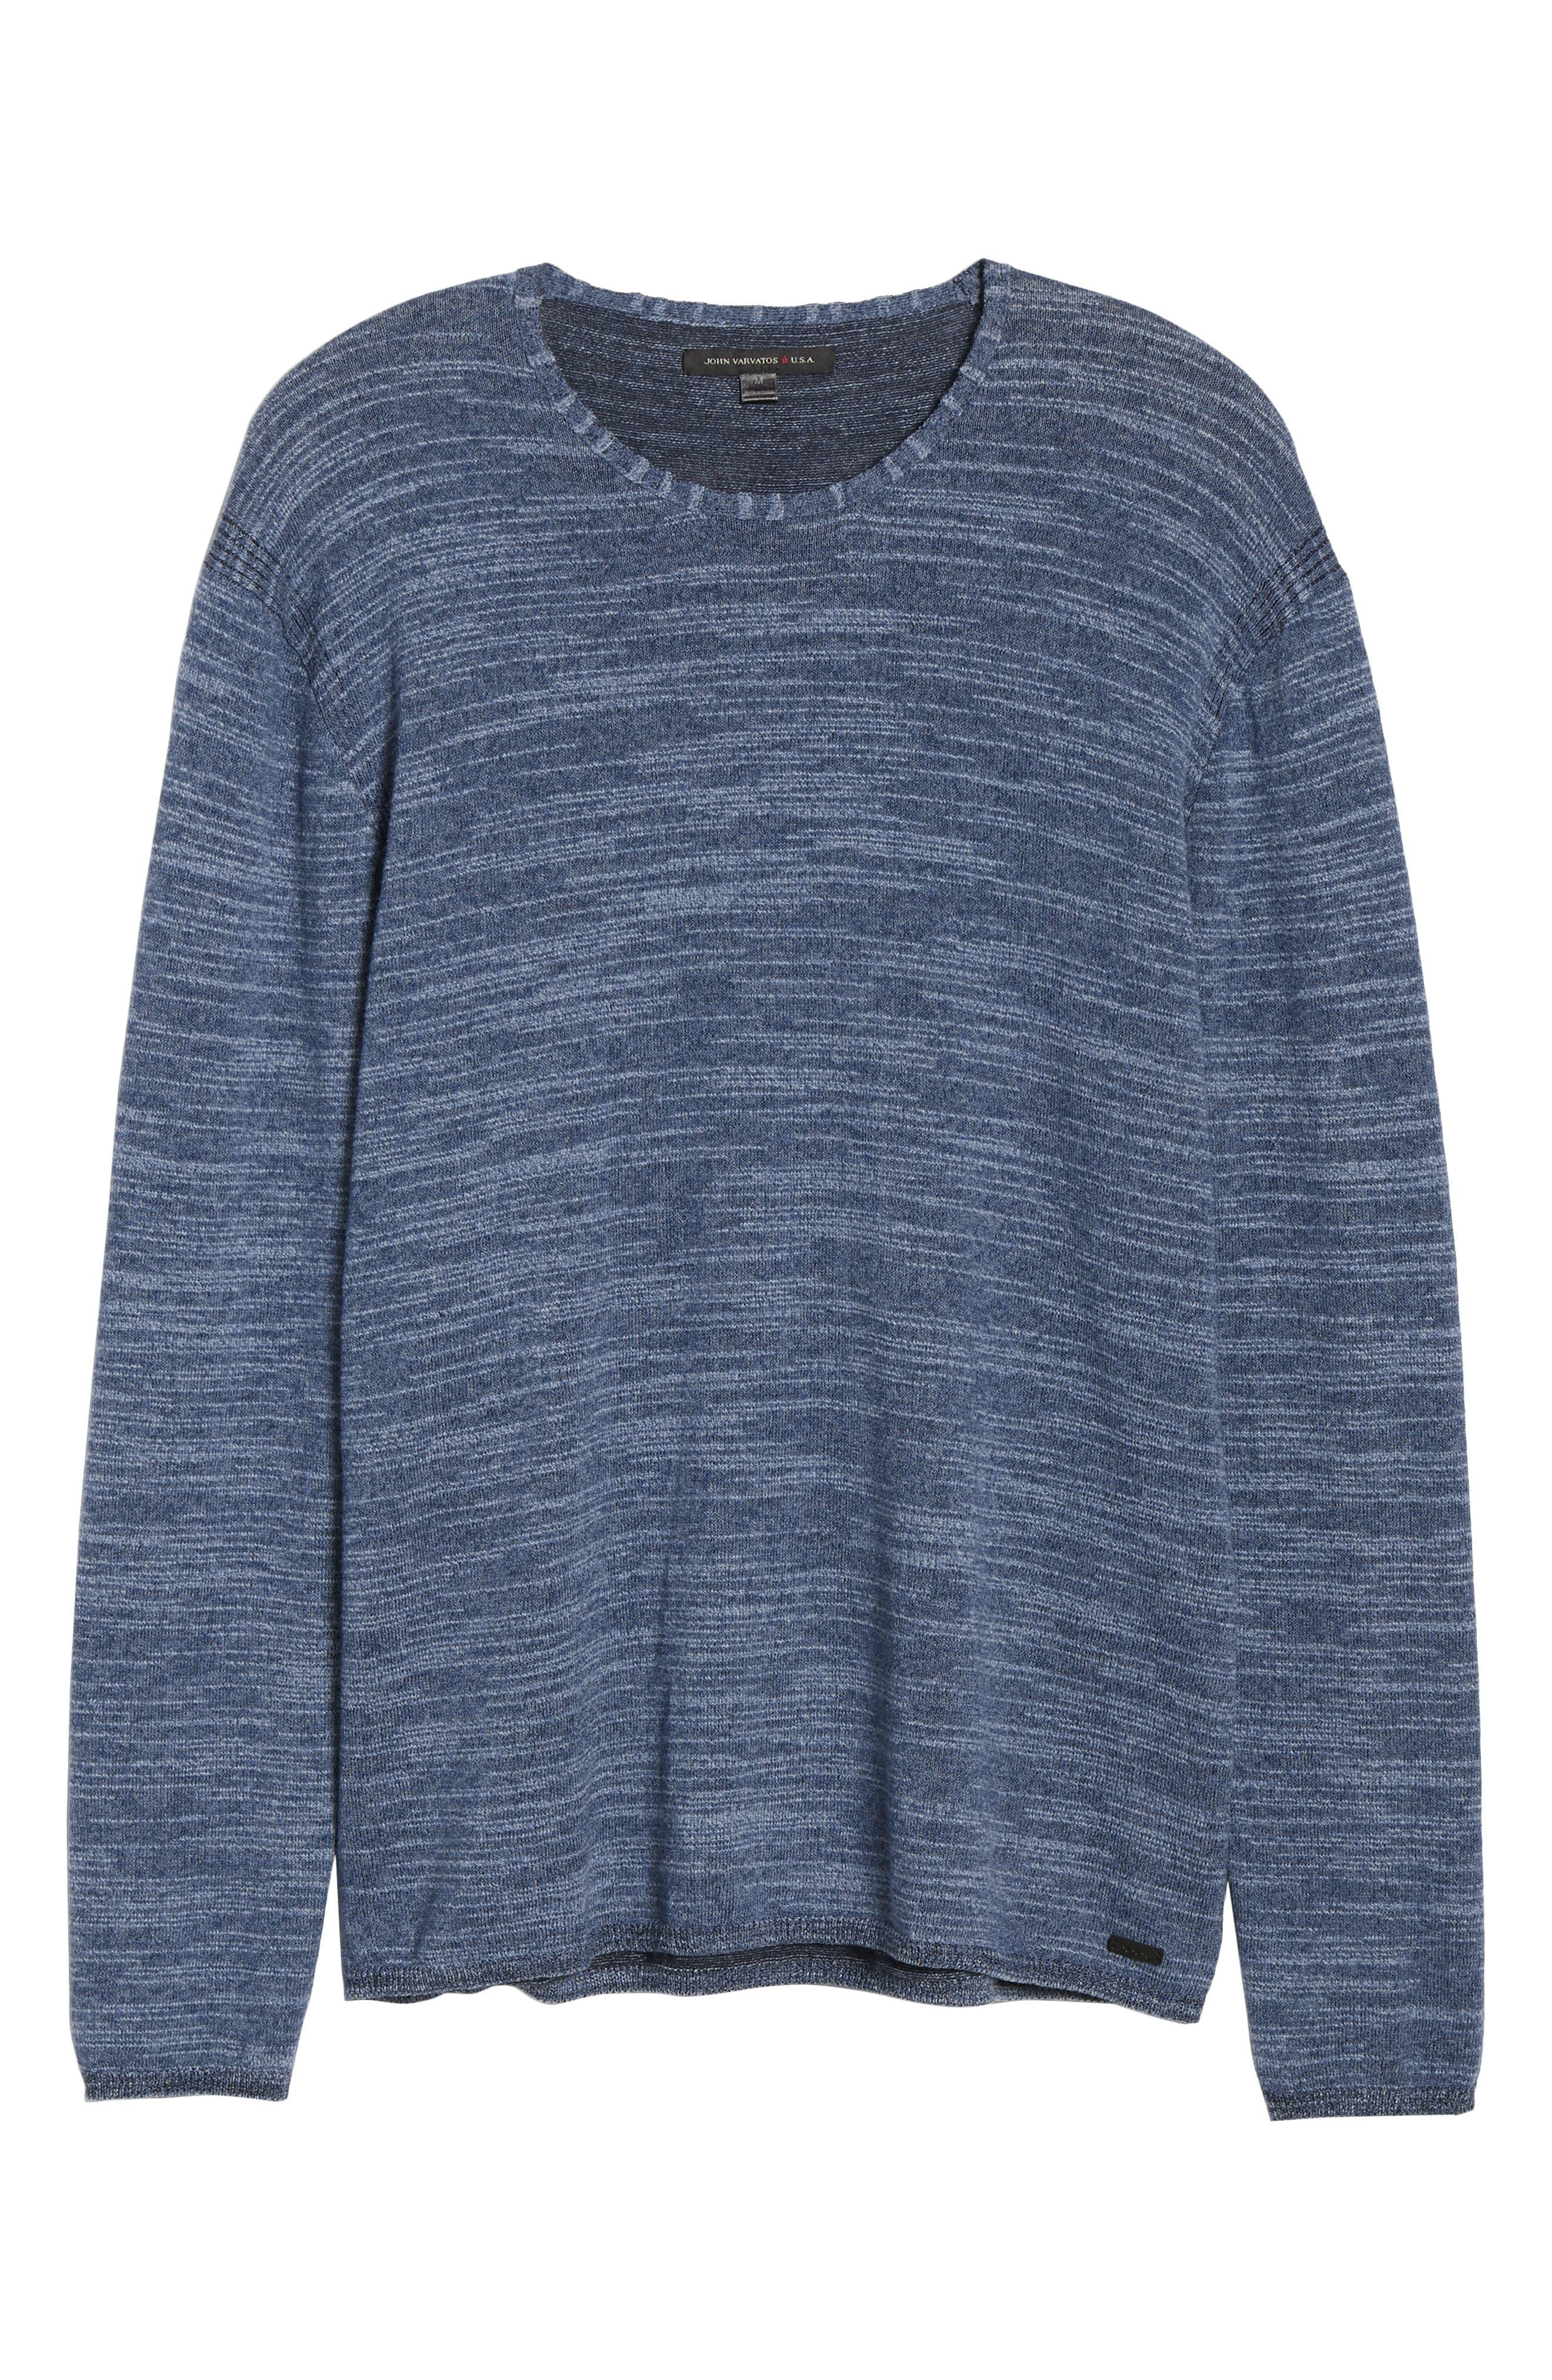 Vincent Plated Regular Fit Crewneck Sweater,                             Alternate thumbnail 6, color,                             STREAM BLUE